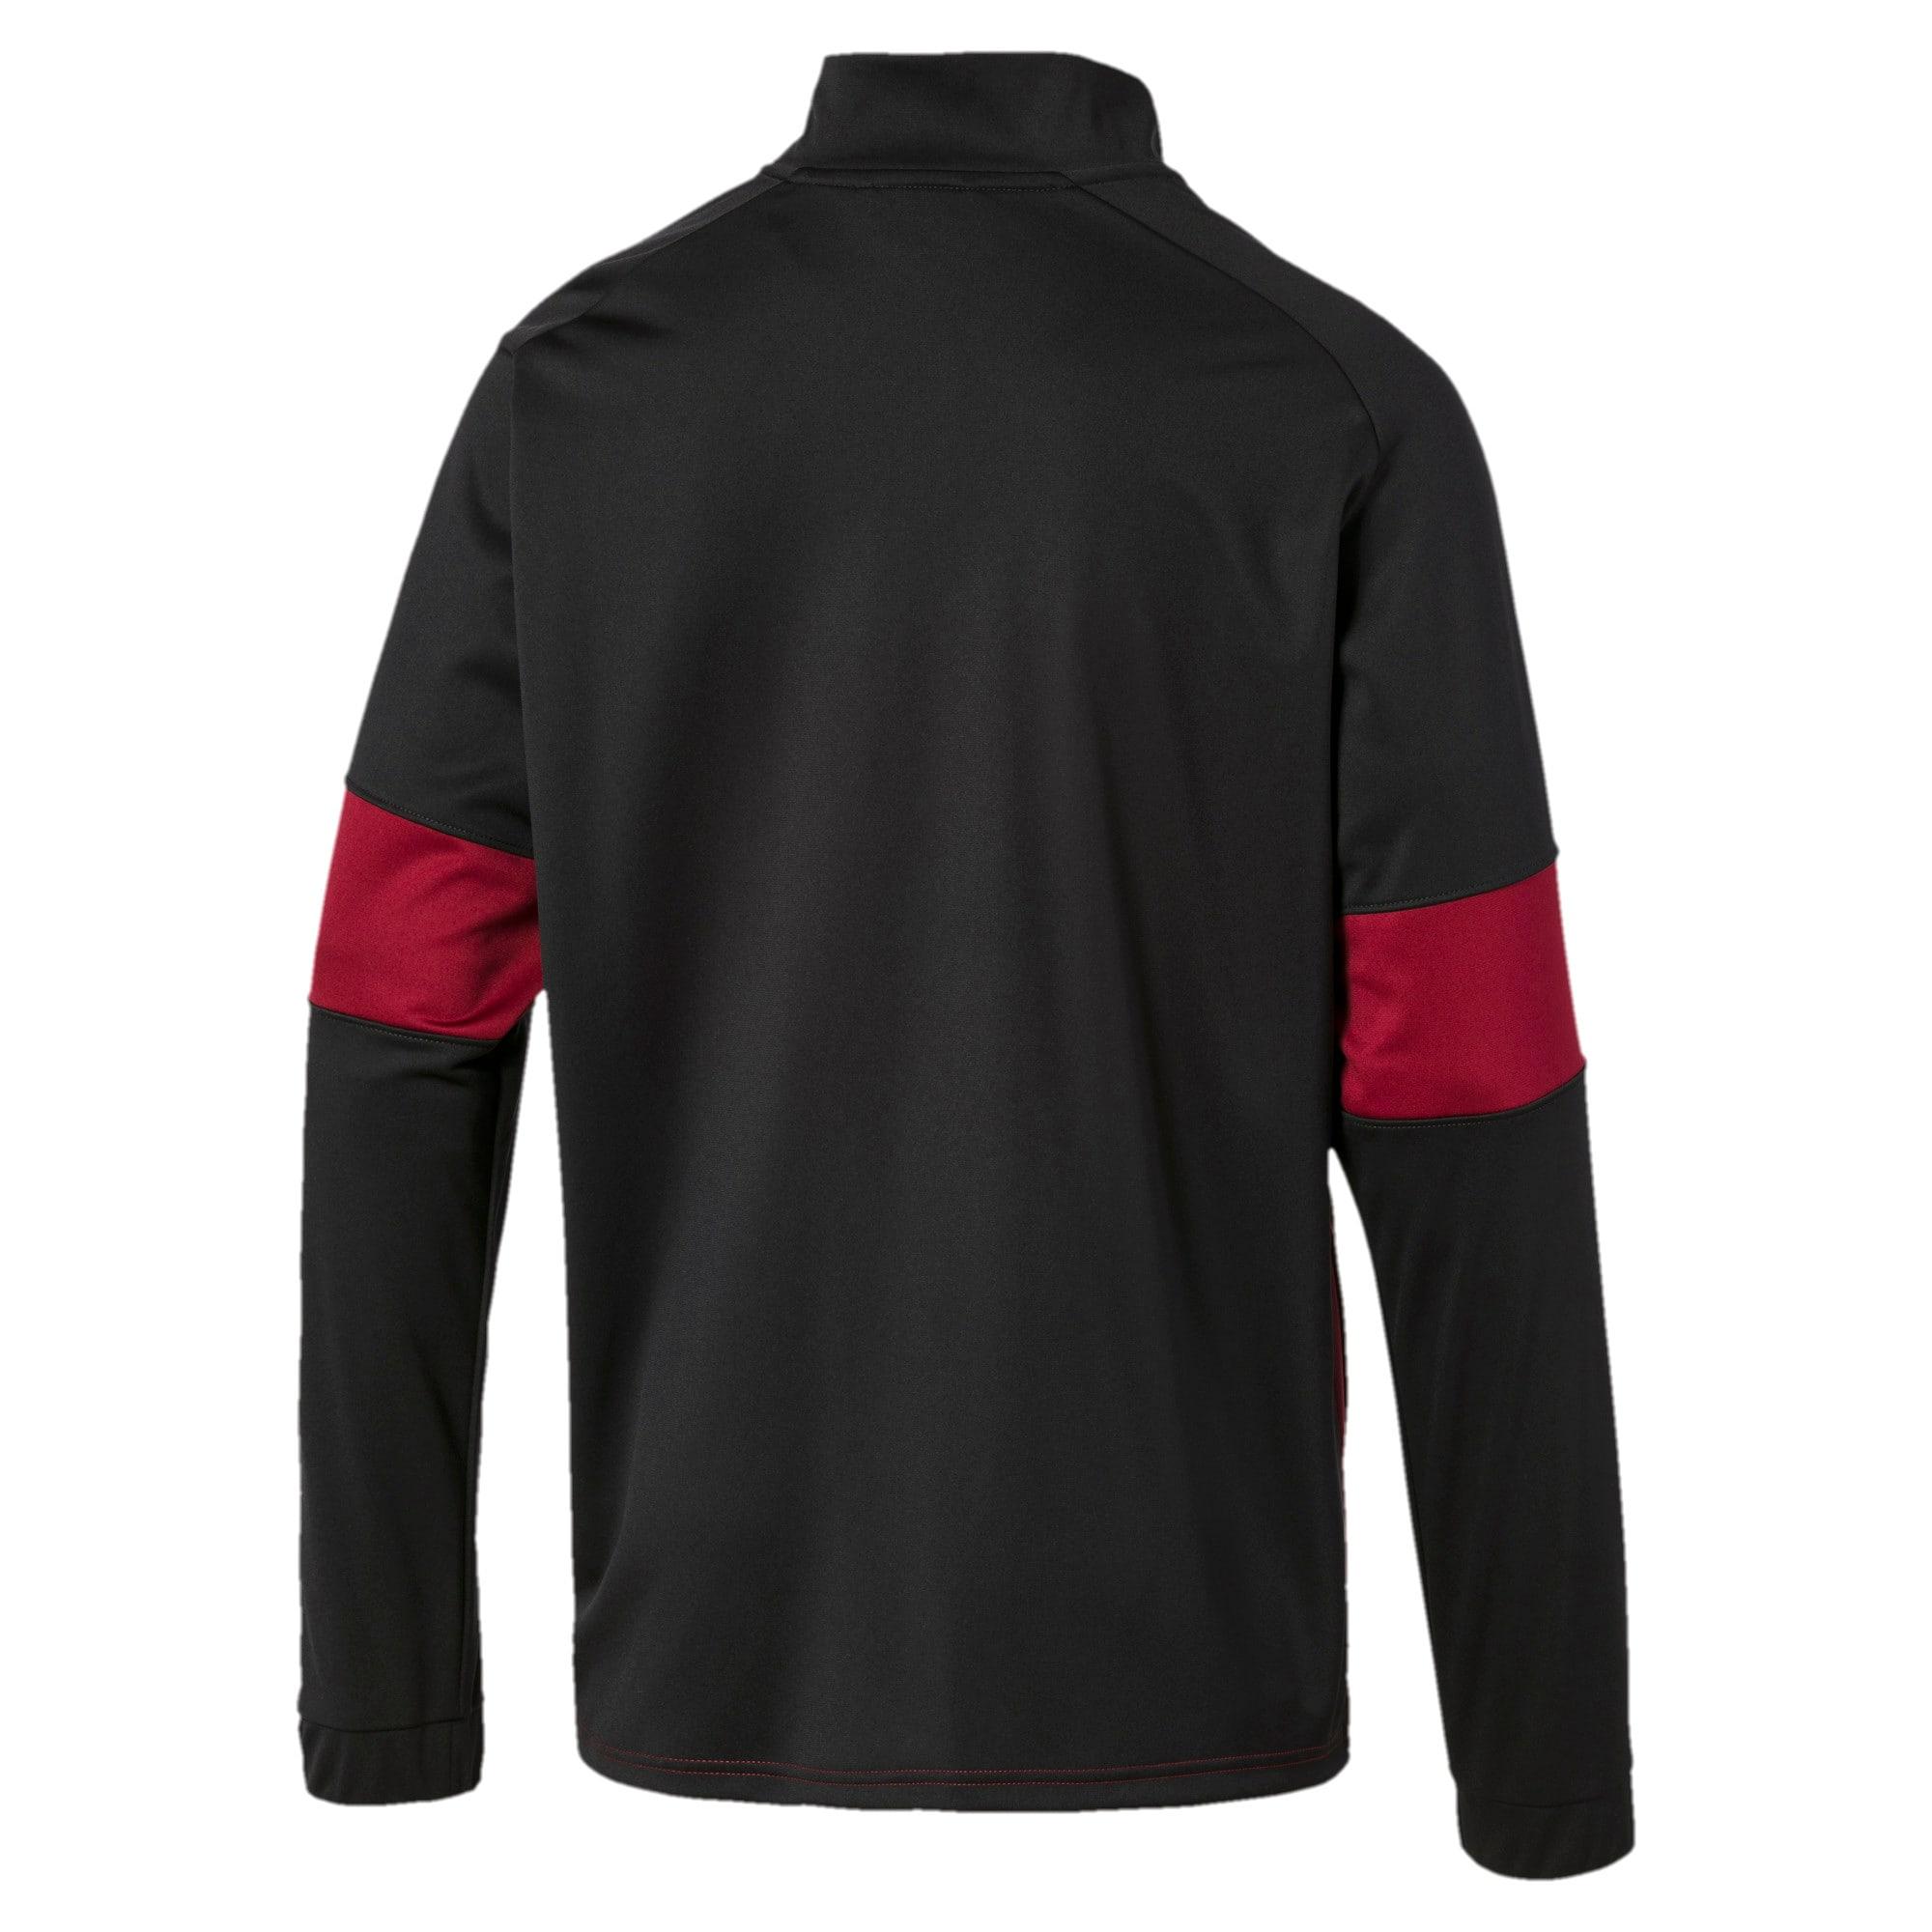 Thumbnail 5 of PUMA Blaster Men's Jacket, Puma Black-Rhubarb, medium